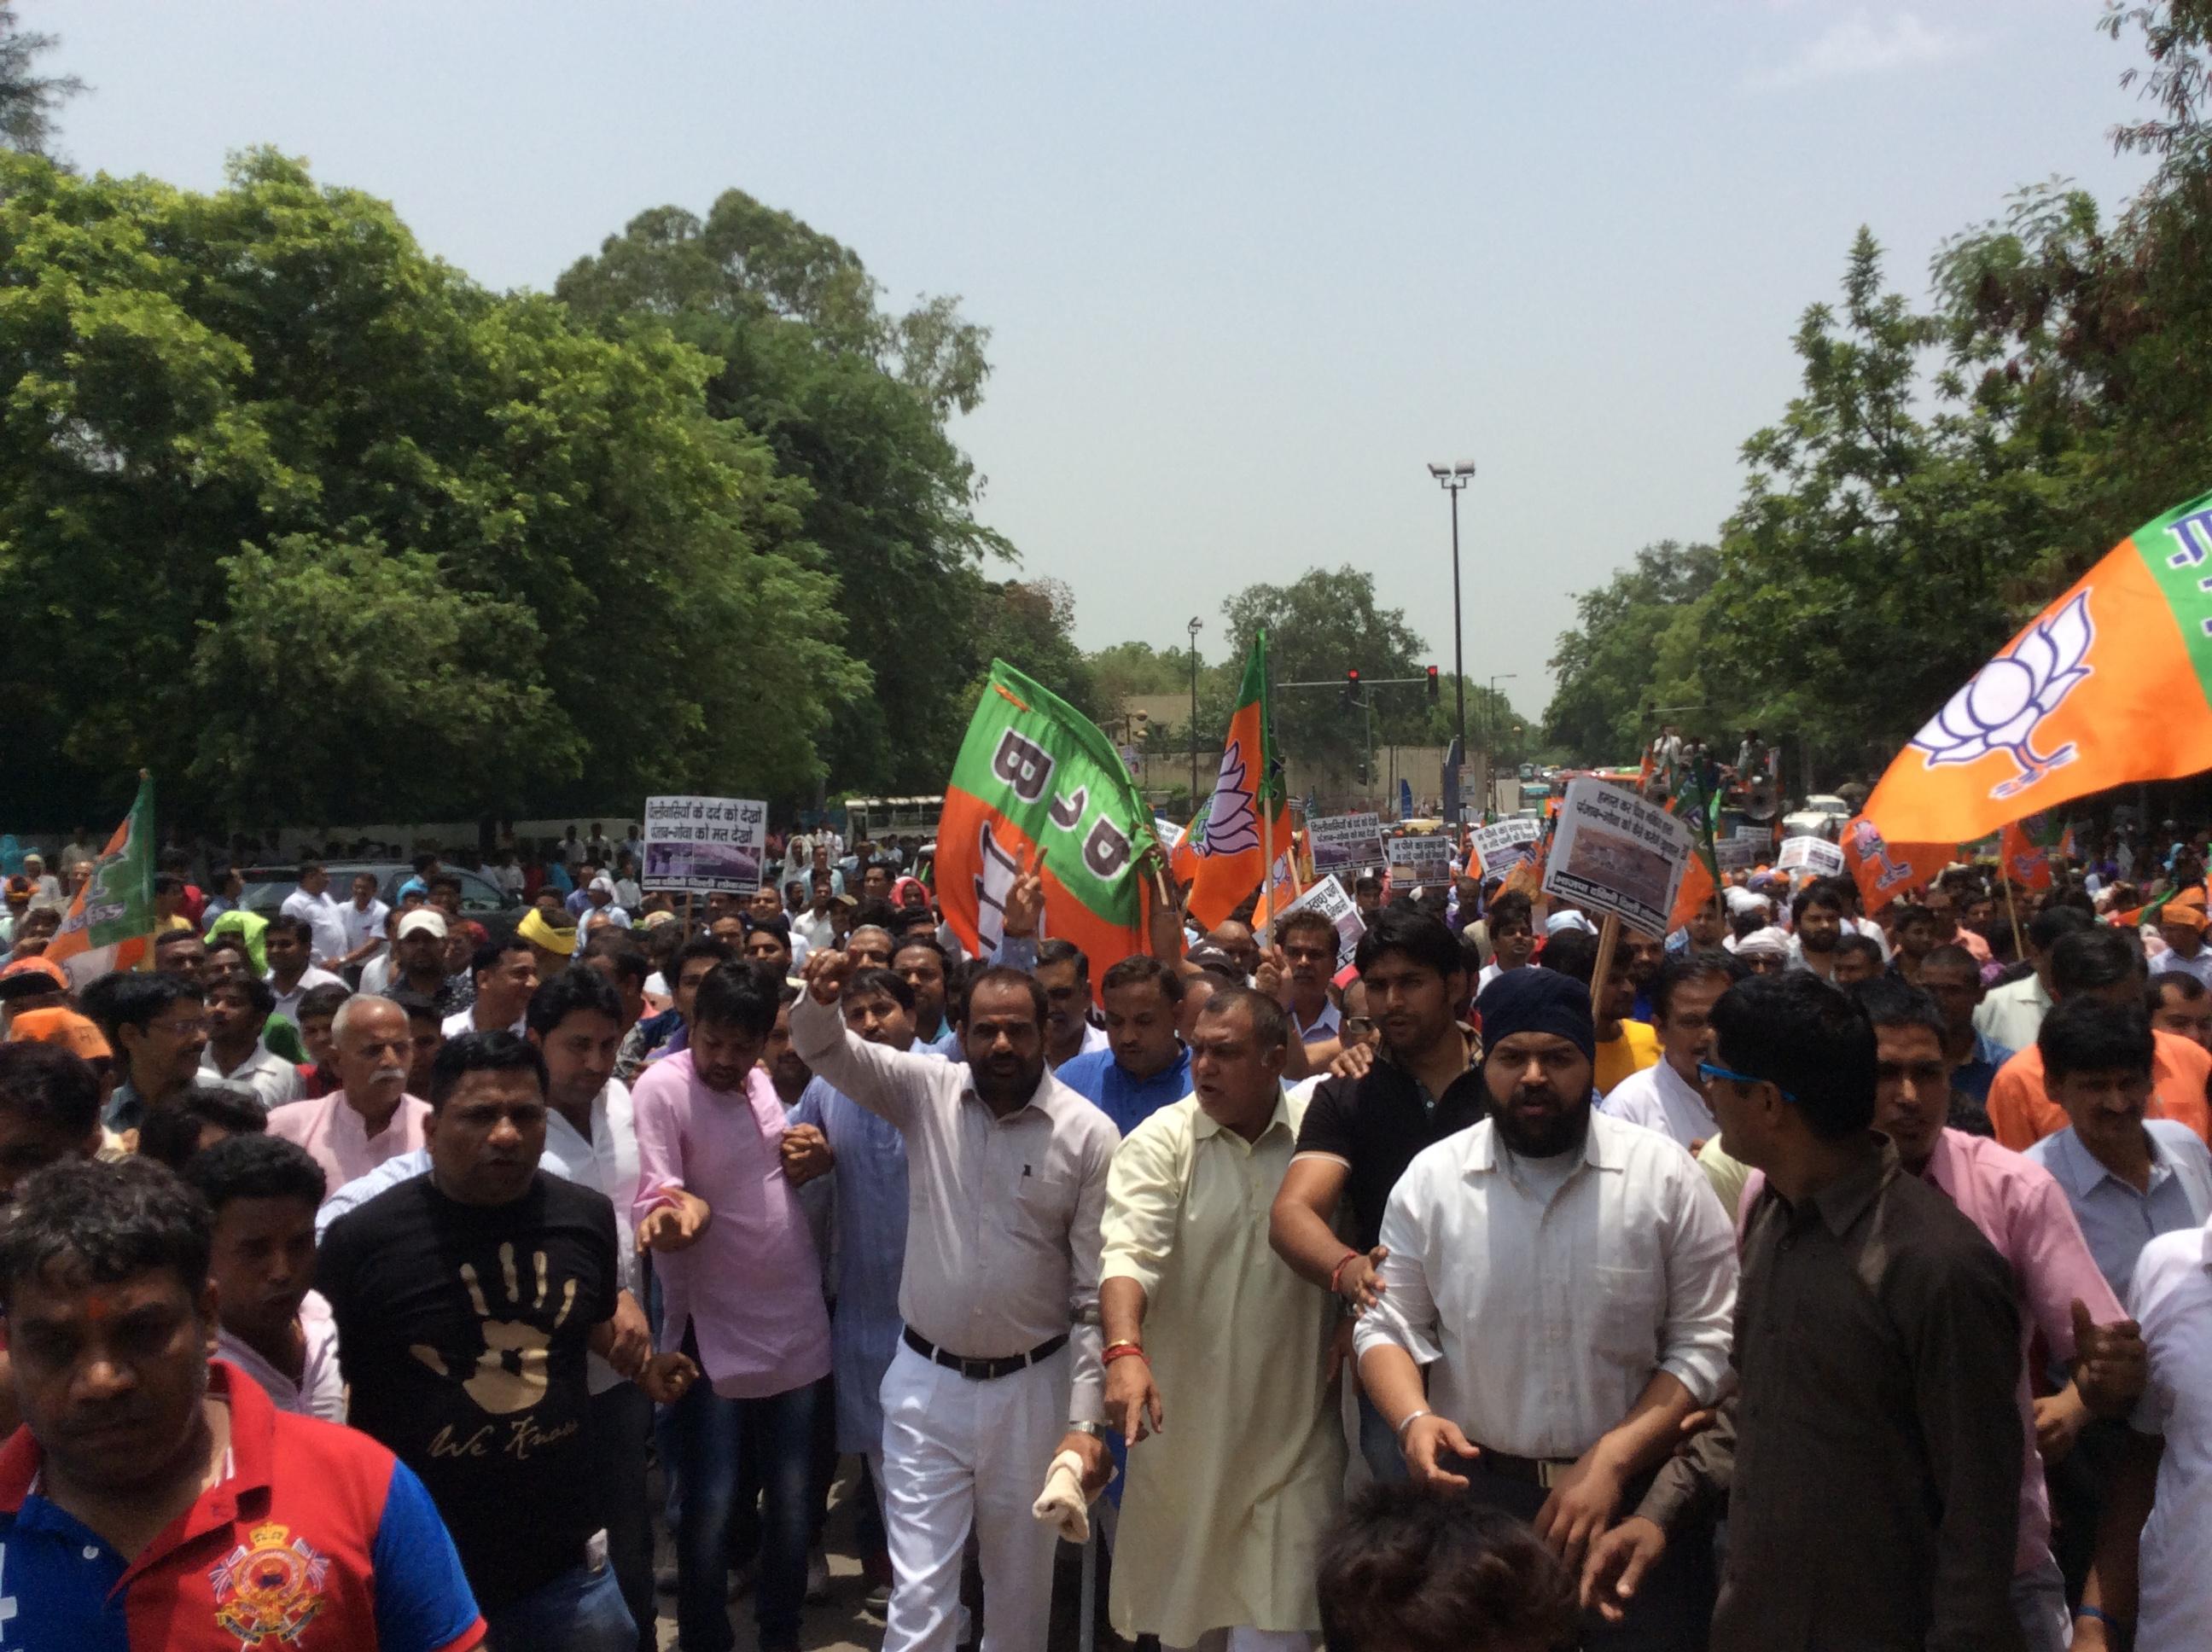 31.05.2016 Protest Regularization of Unauthorized Colonies in Delhi